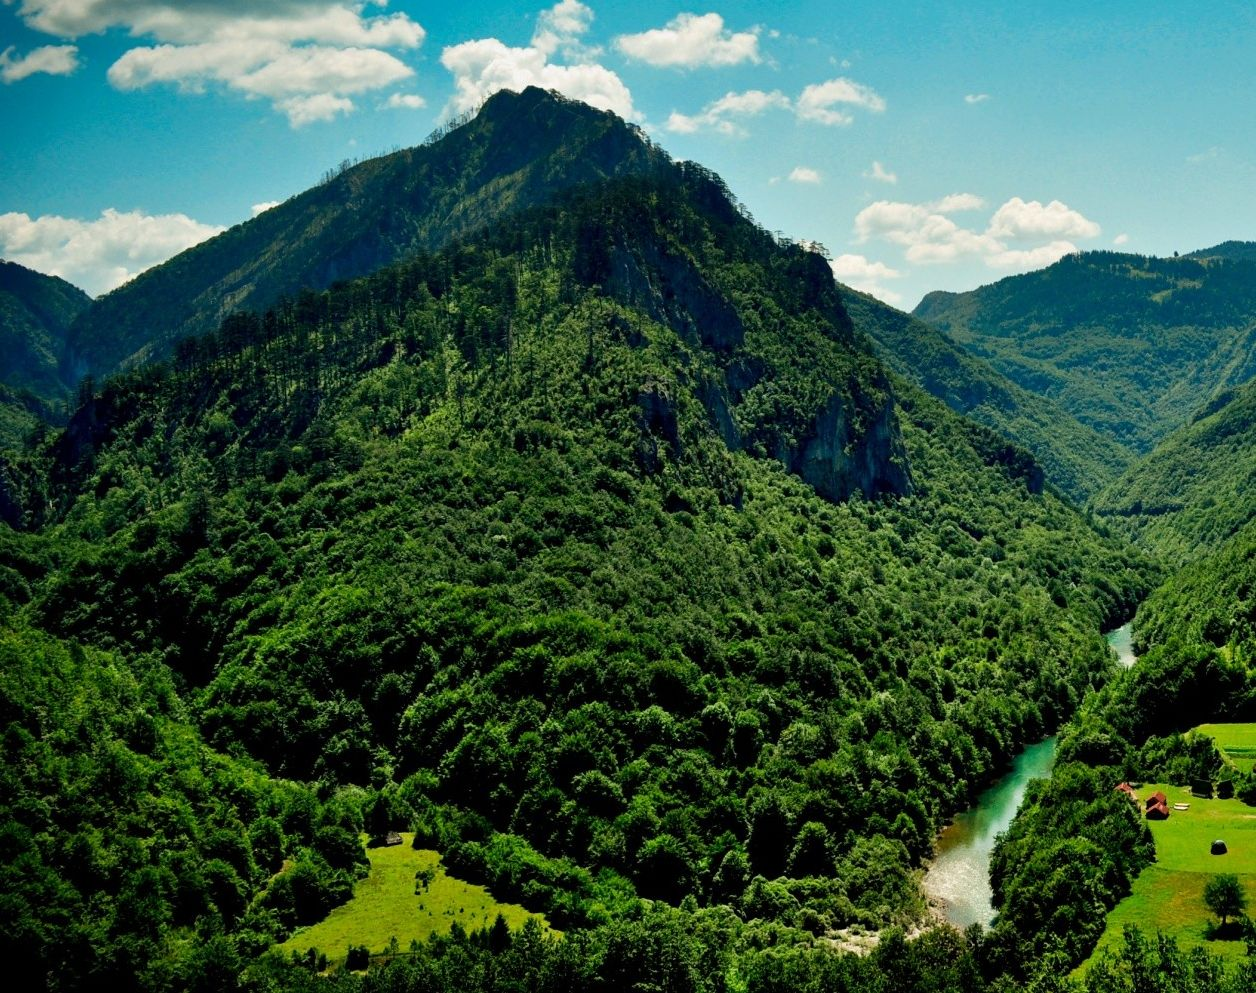 Grandes montanas verdes-67919